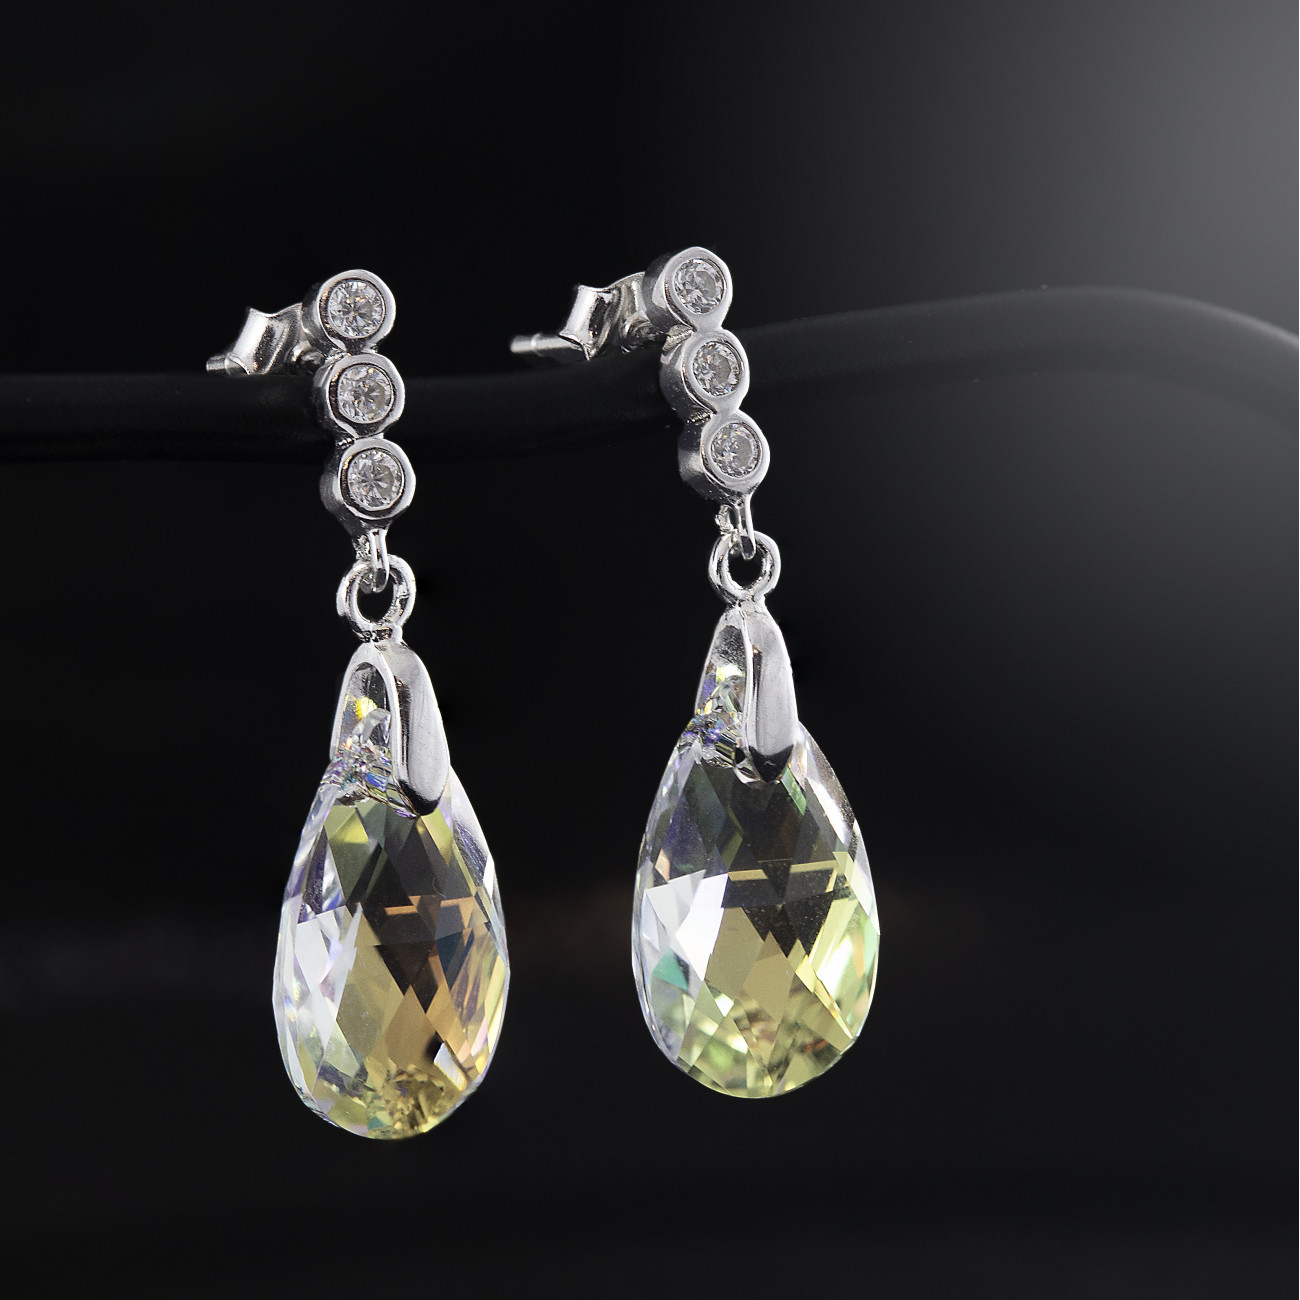 Stříbrné náušnice Savour s pravým krystalem Swarovski Aurore Boreale